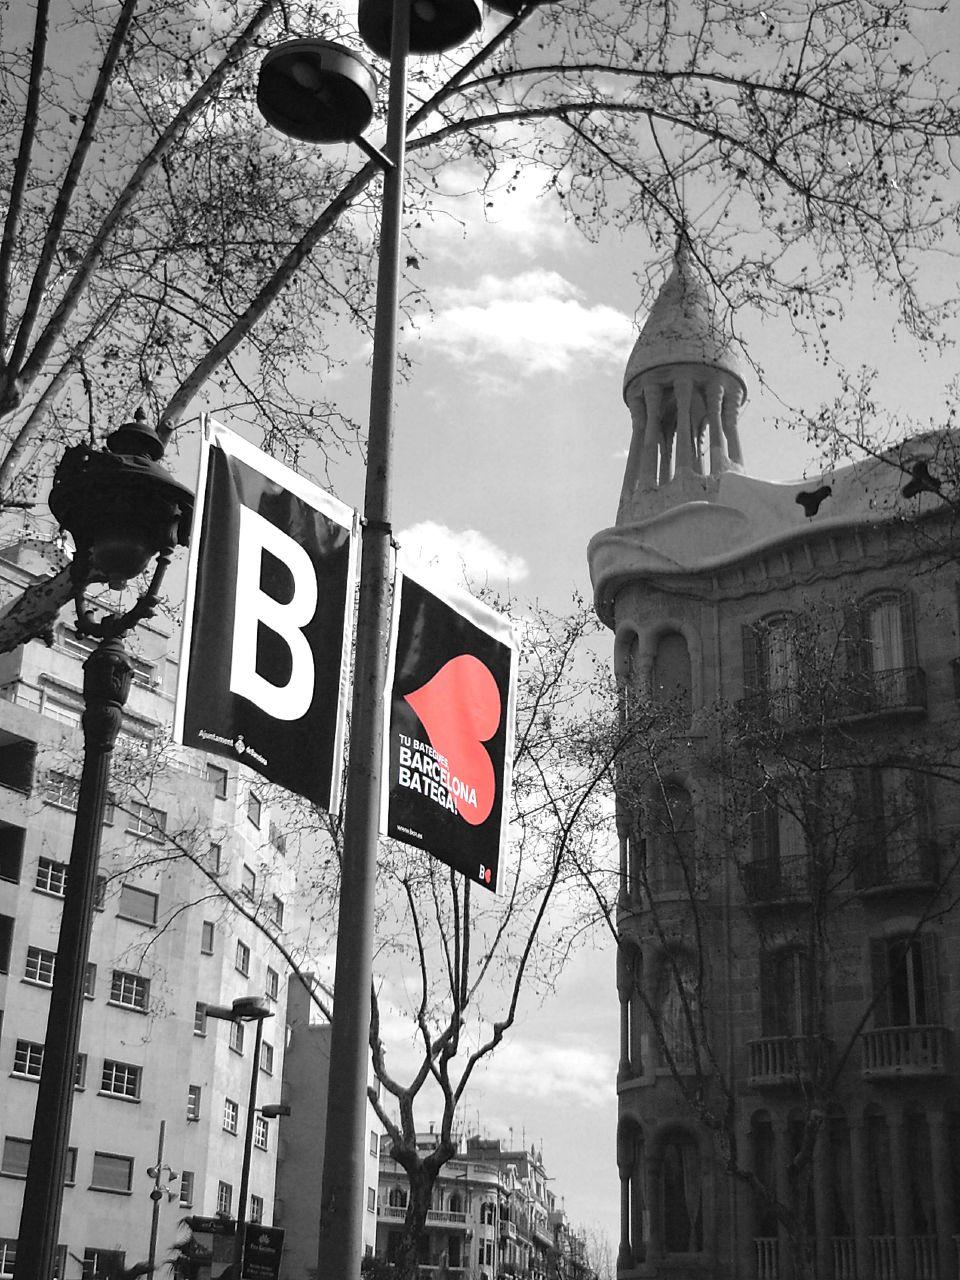 Barcelona Batega Campaign